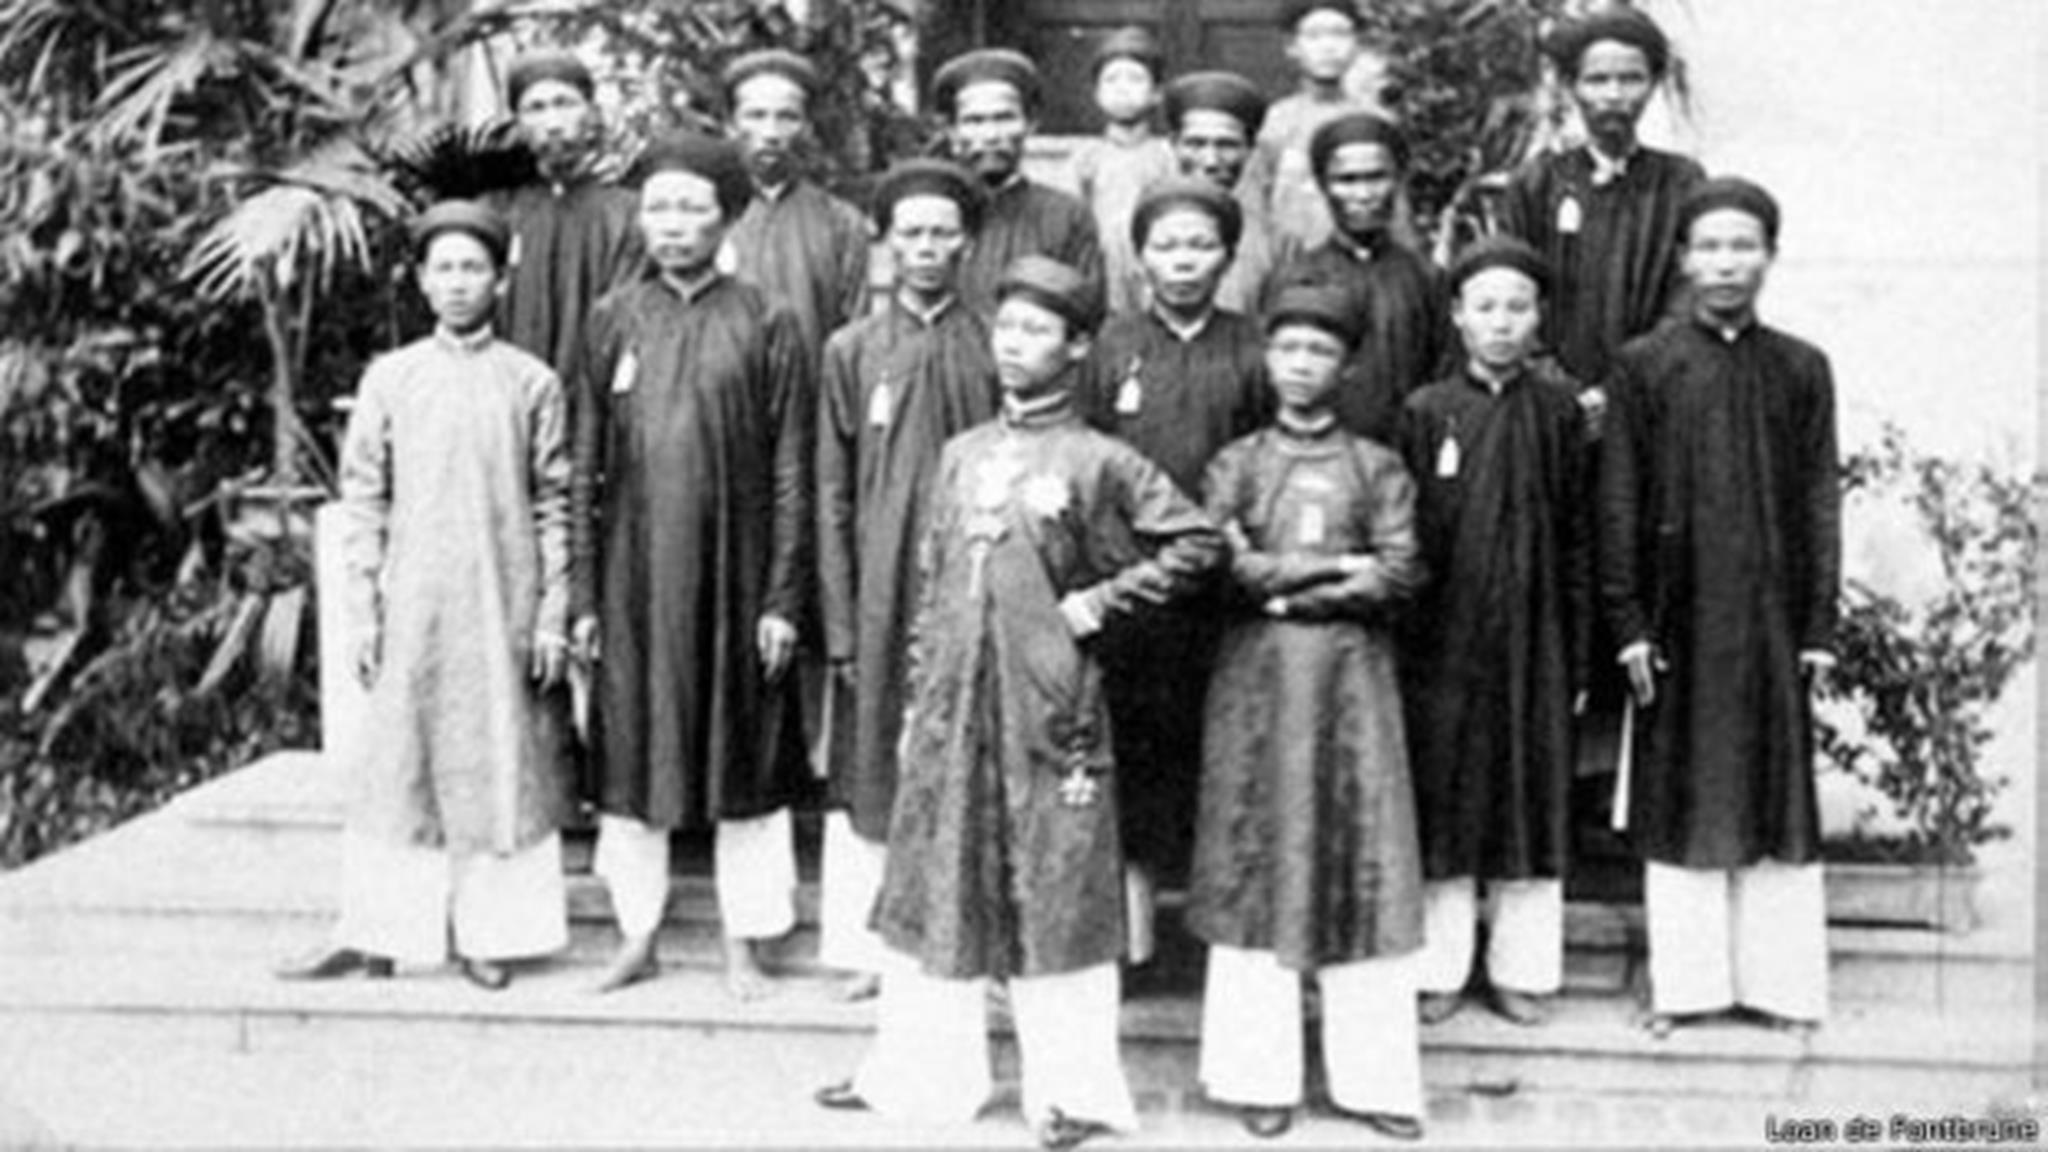 Image copyrightLoan de Fontbrune Image caption Vua Thành Thái và triều thần - tác giả Pierre Dieulefils